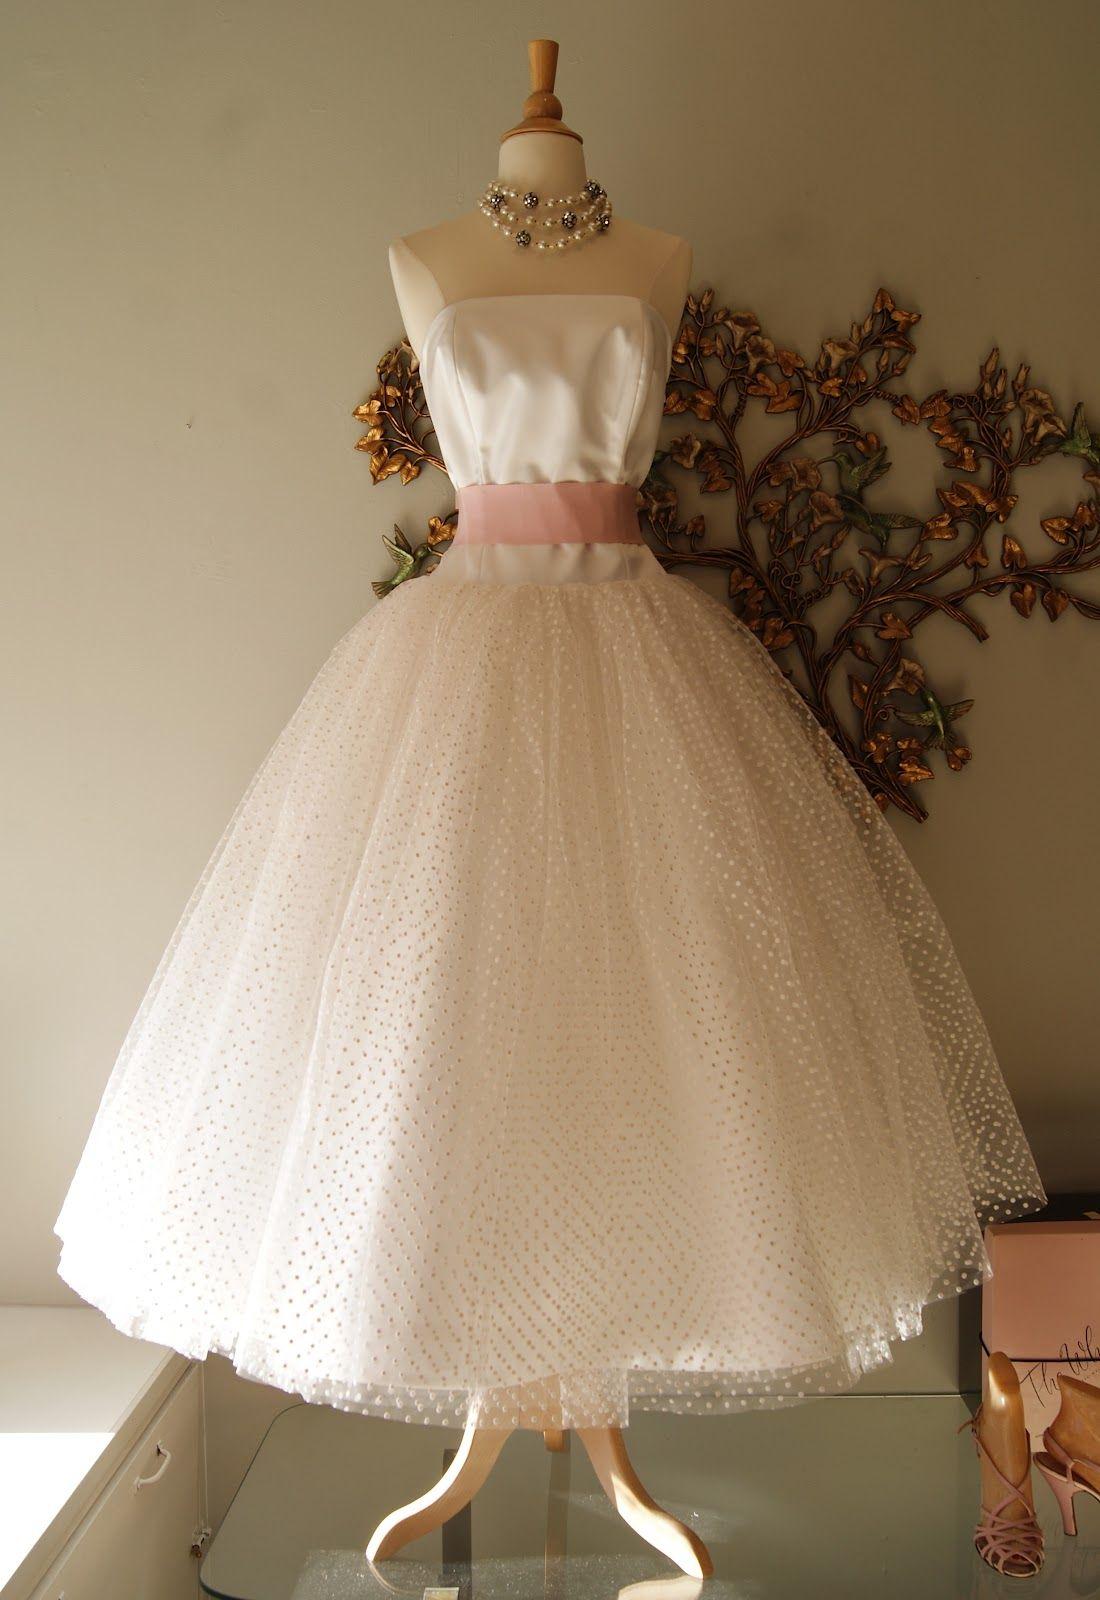 Xtabay vintage clothing boutique portland oregon 50s style xtabay vintage clothing boutique portland oregon 50s style polka dot tulle wedding dress ombrellifo Gallery